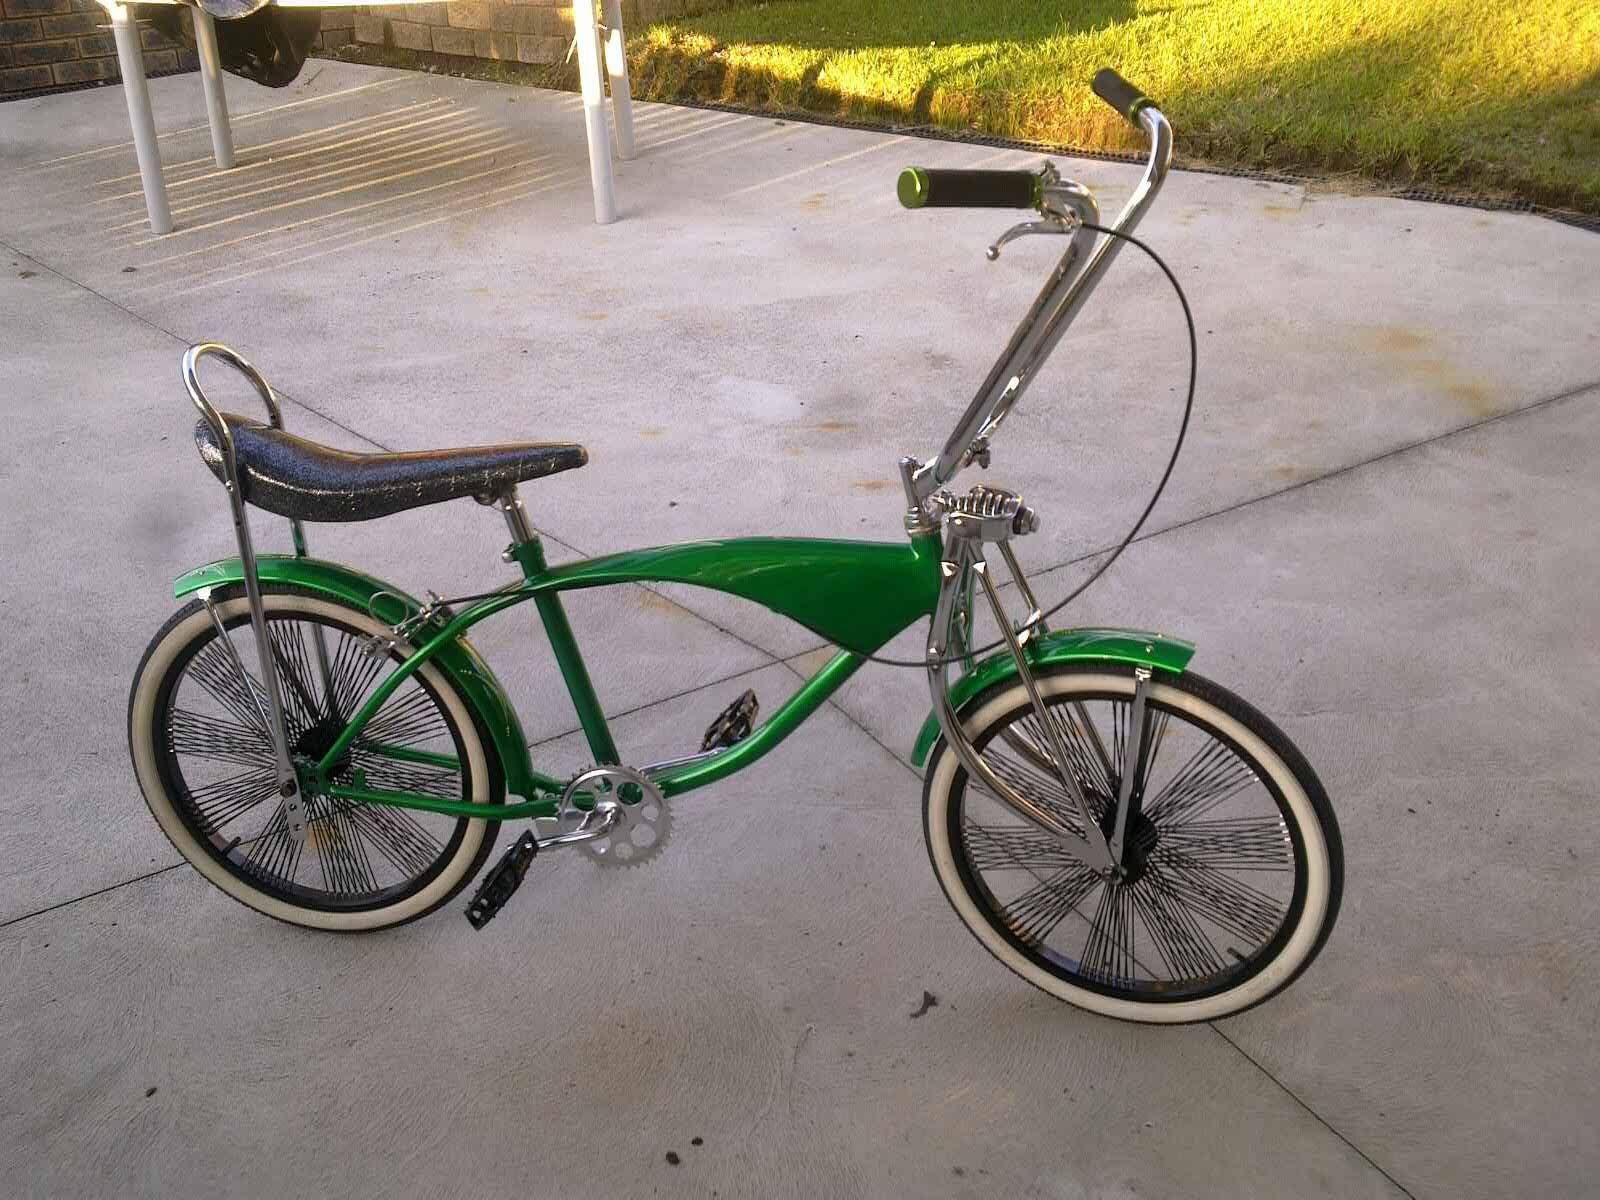 Bikes frames for sale, Shop wholesale bike frames, bicycle